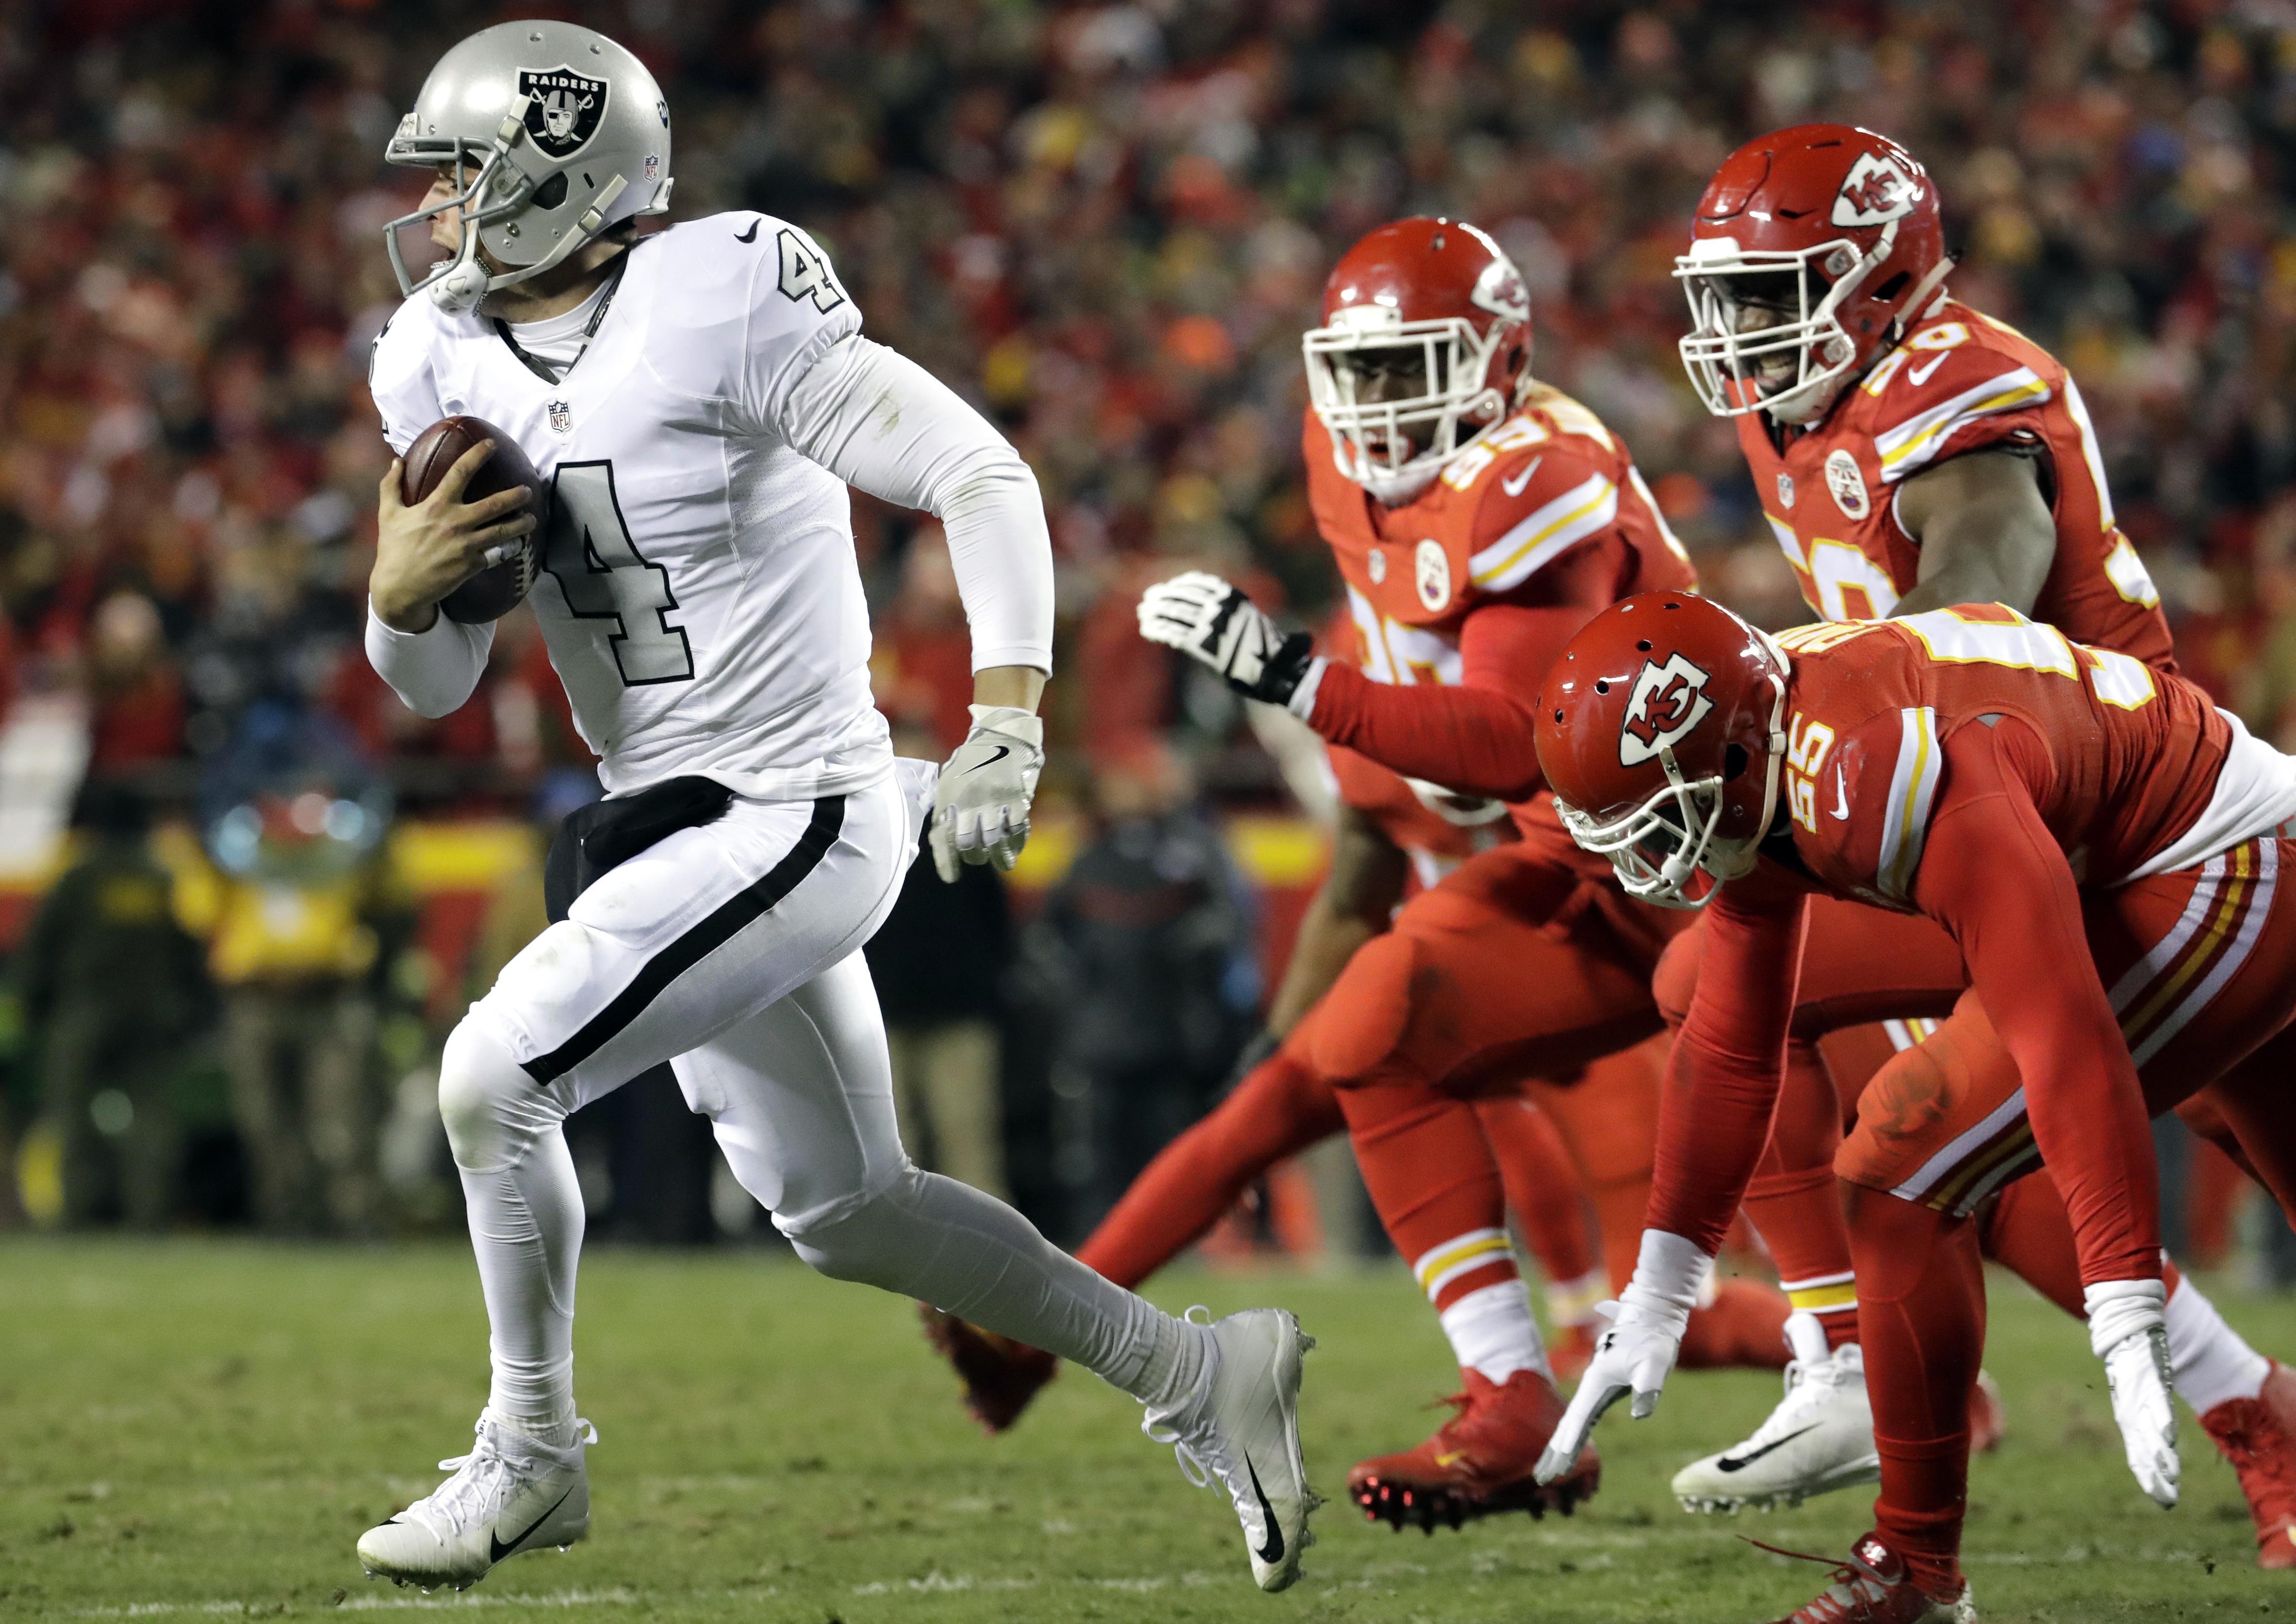 Oakland Raiders quarterback Derek Carr (4) runs away from Kansas City Chiefs linebacker Dee Ford (55), defensive lineman Rakeem Nunez-Roches (99) and linebacker Justin Houston (50) during the first half of an NFL football game in Kansas City, Mo., Thursda